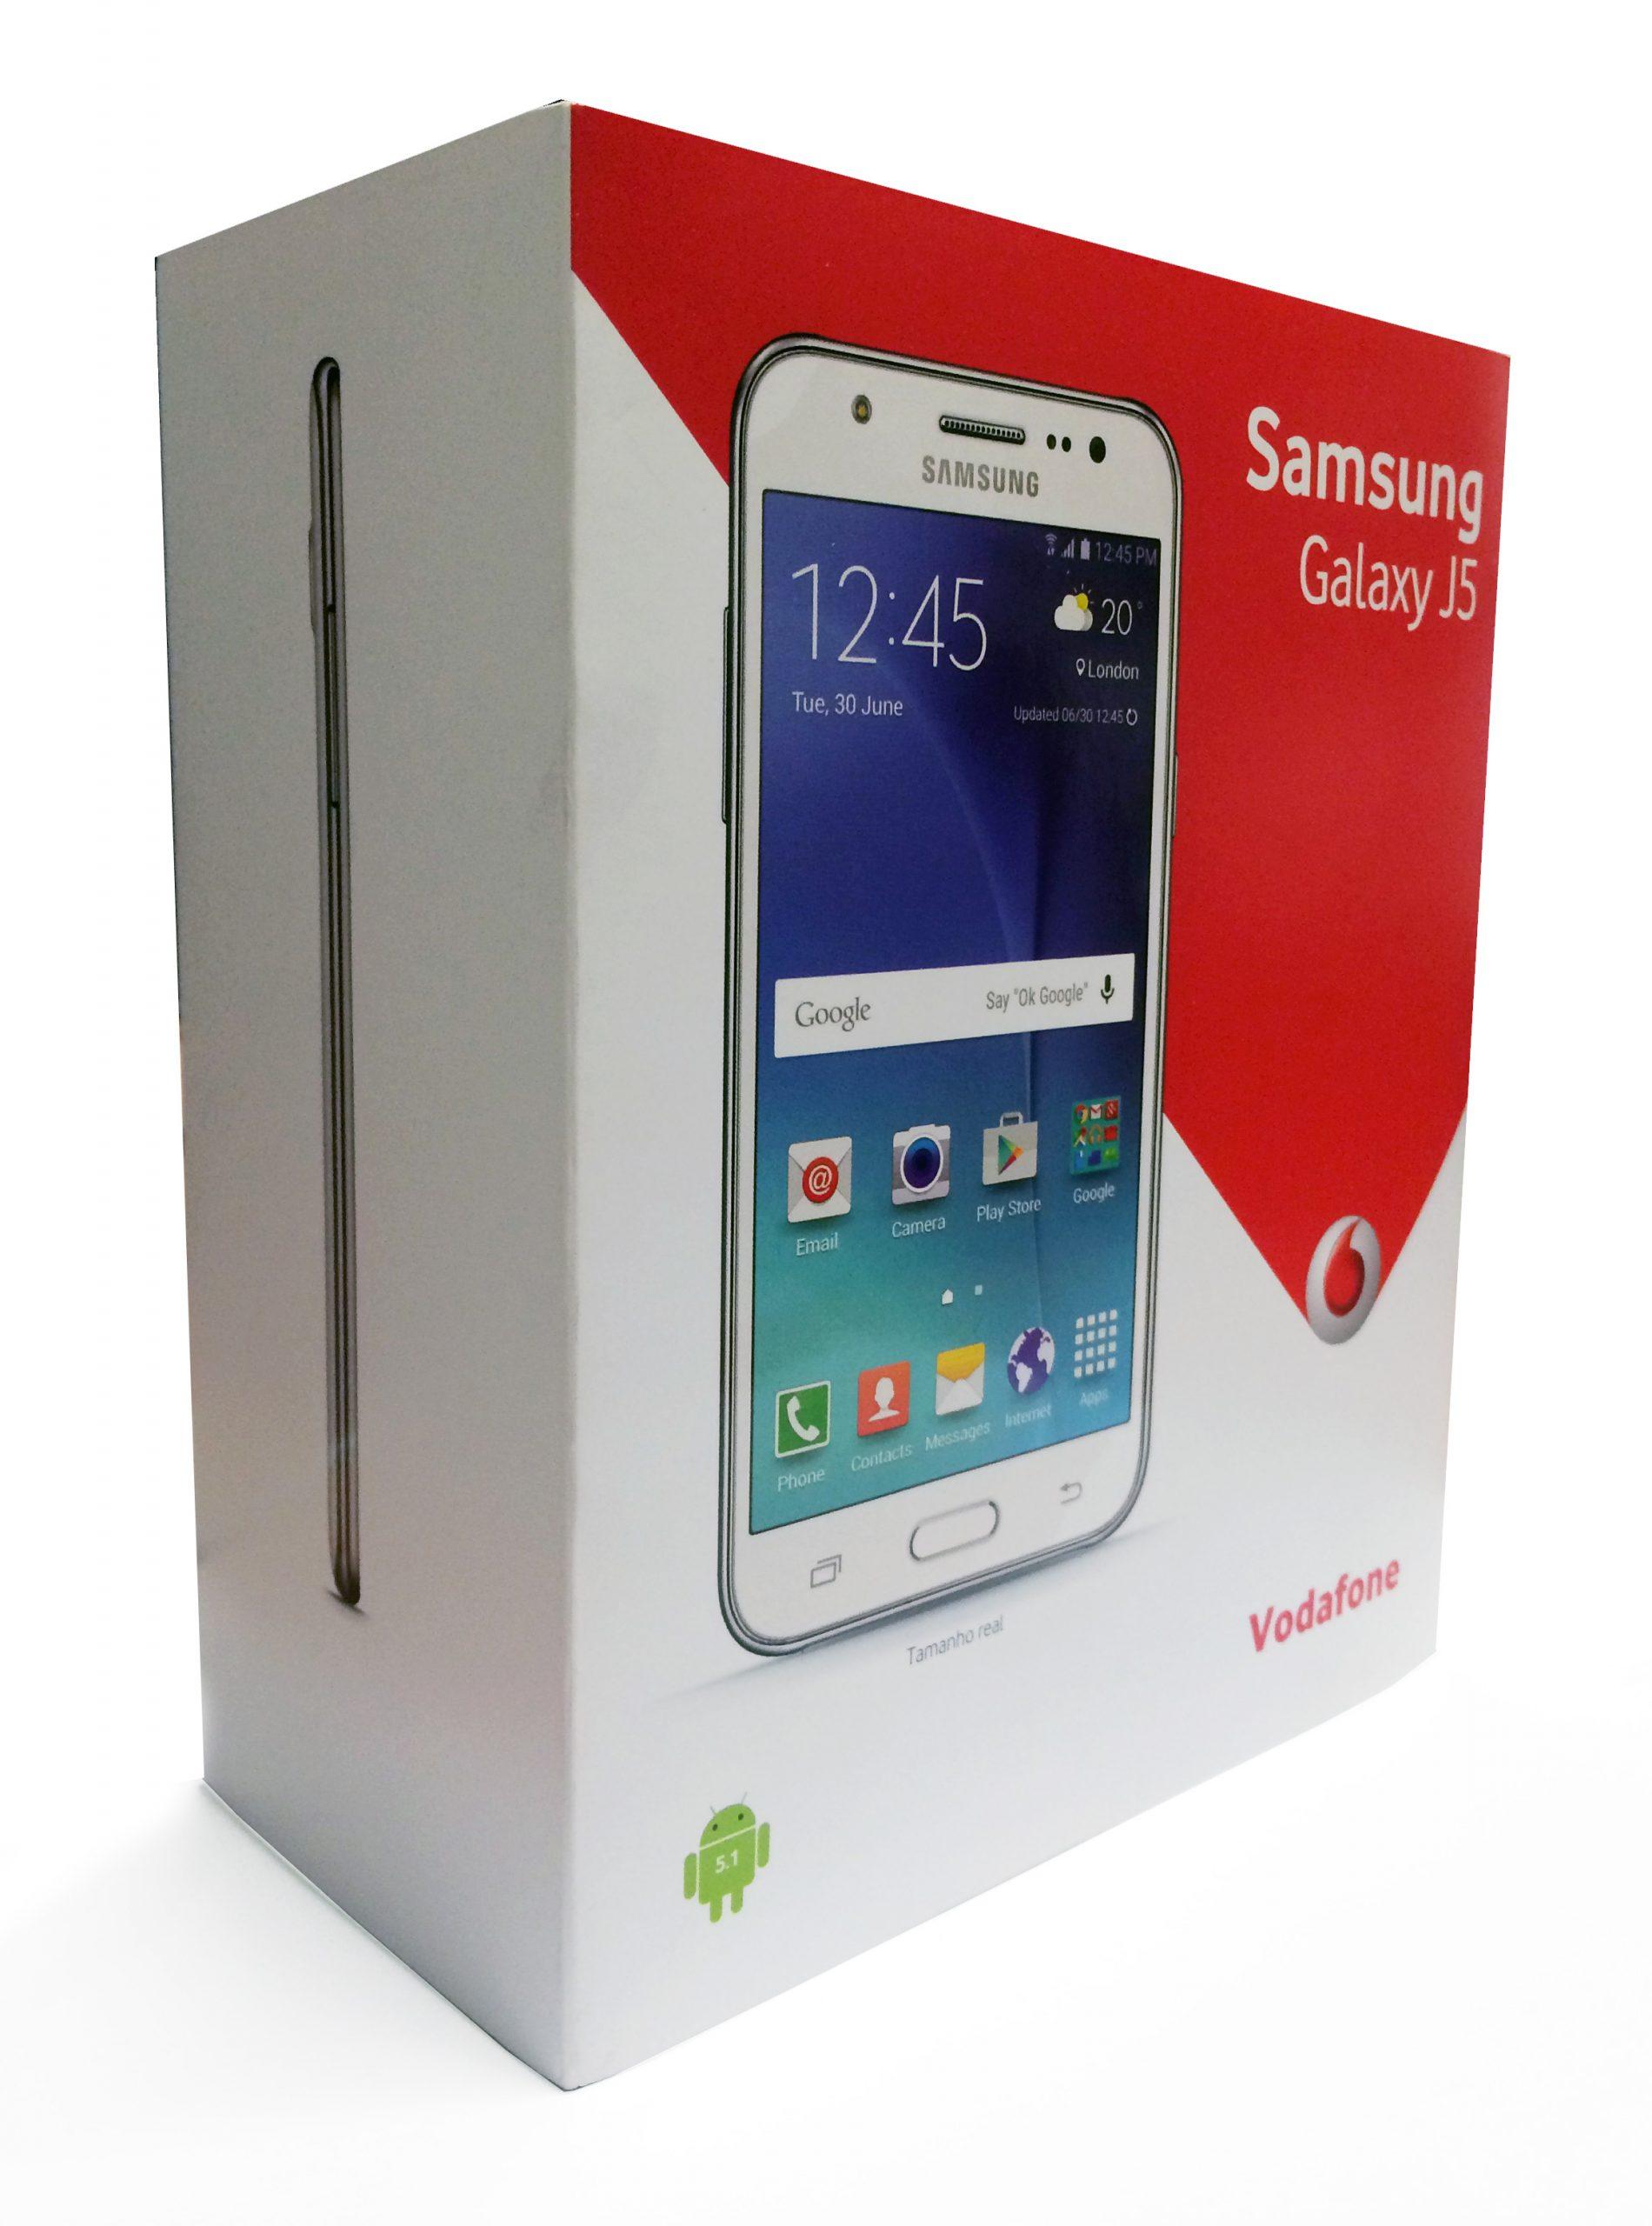 Packaging-Vodafone